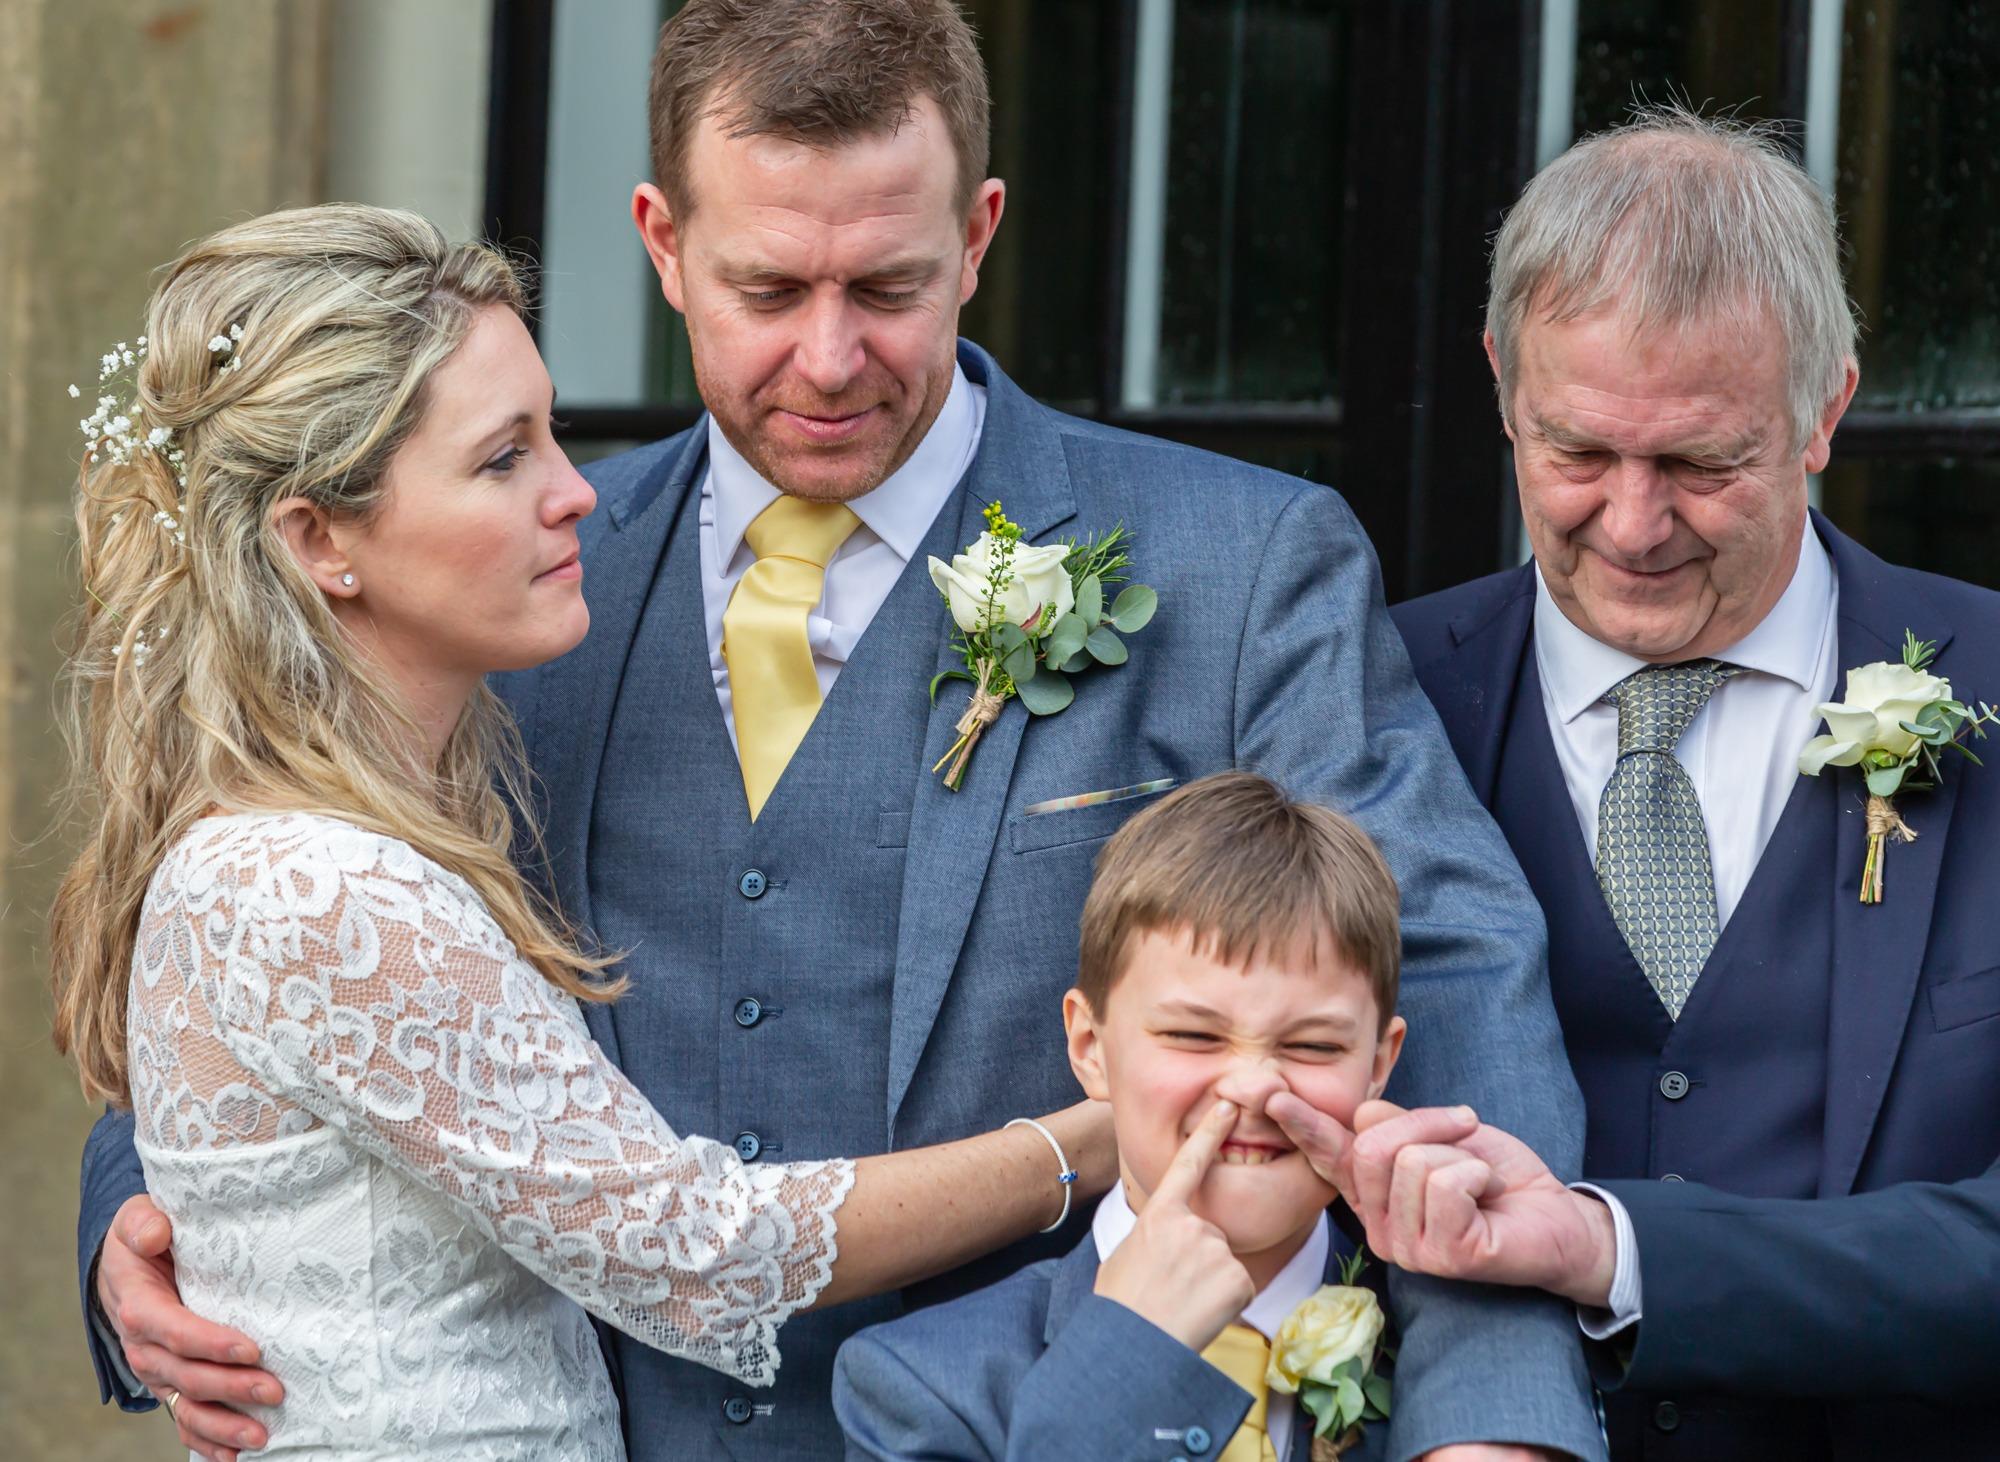 wedding photographer hertfordshire Buckinghamshire Bedfordshire Berkshire